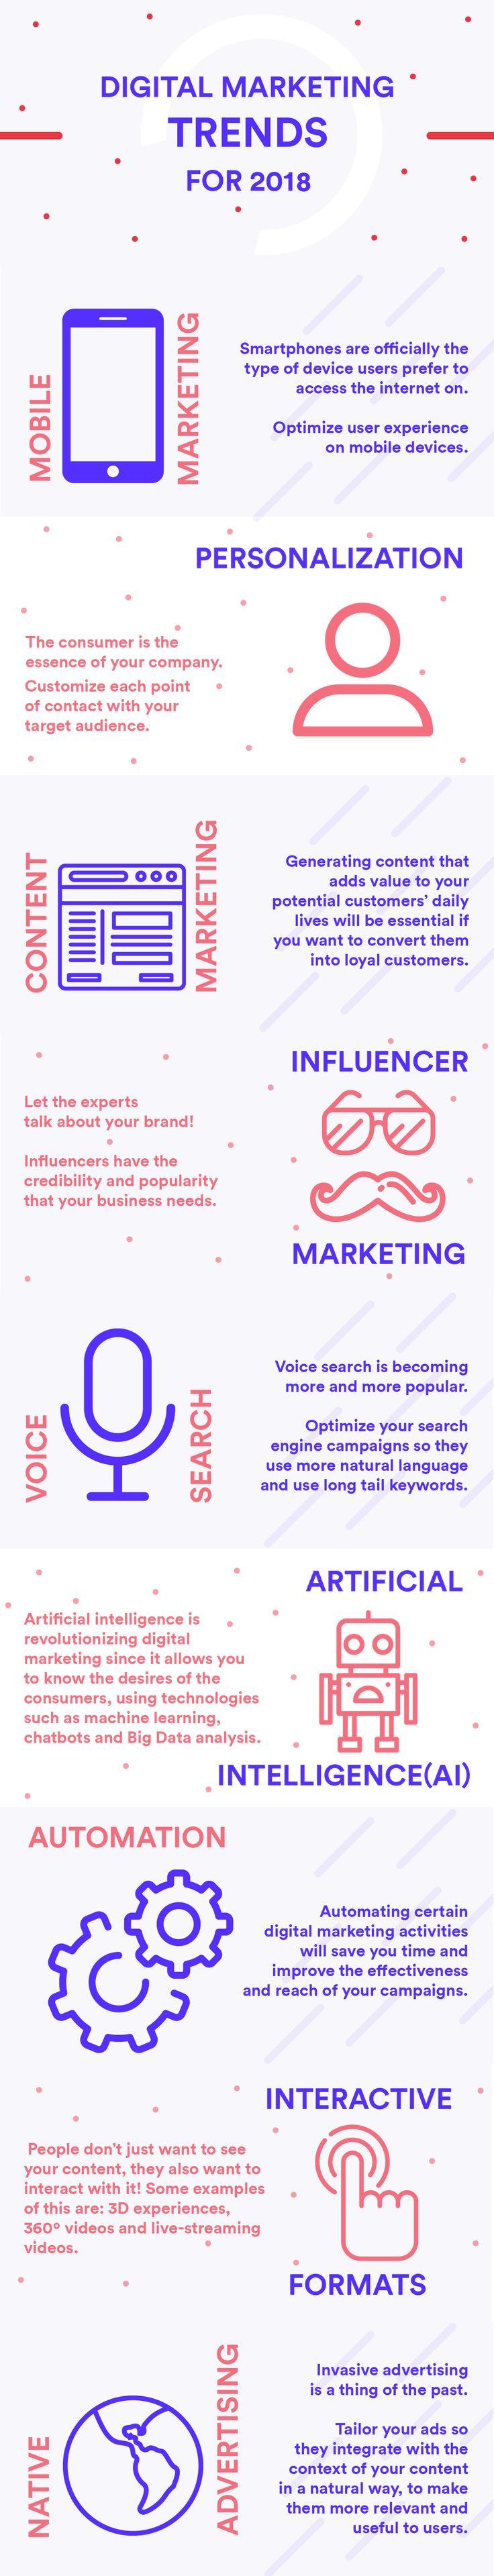 Digital Marketing Trends For 2018 #Infographic #DigitalMarketing #Trends